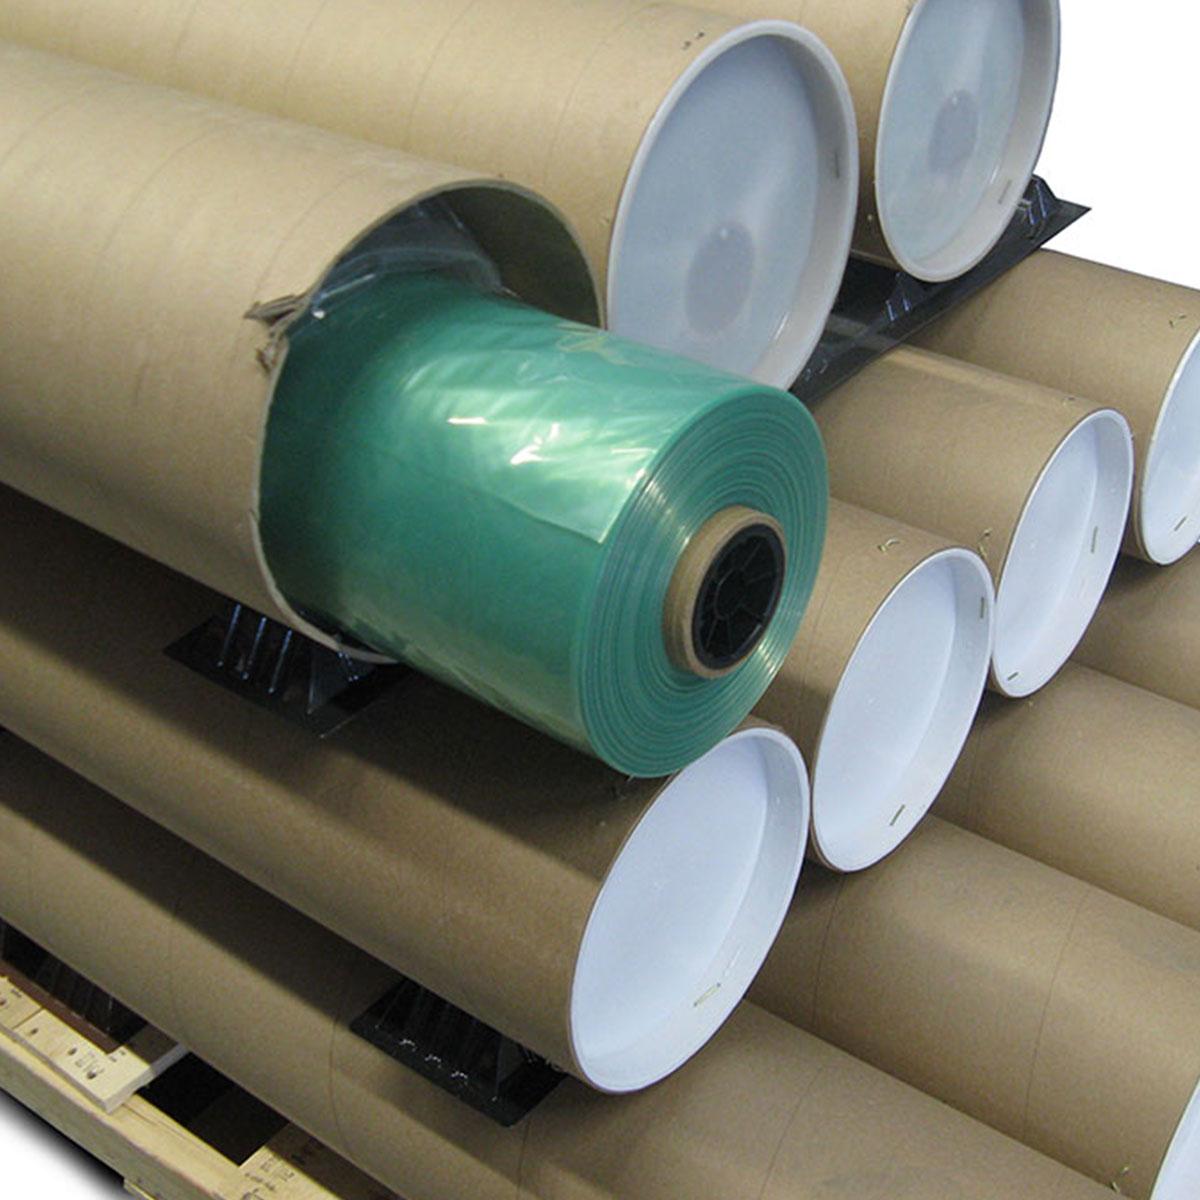 vakuum sack nylon 1500 grn 0076mm x 1500mm 660m 0003 x 60